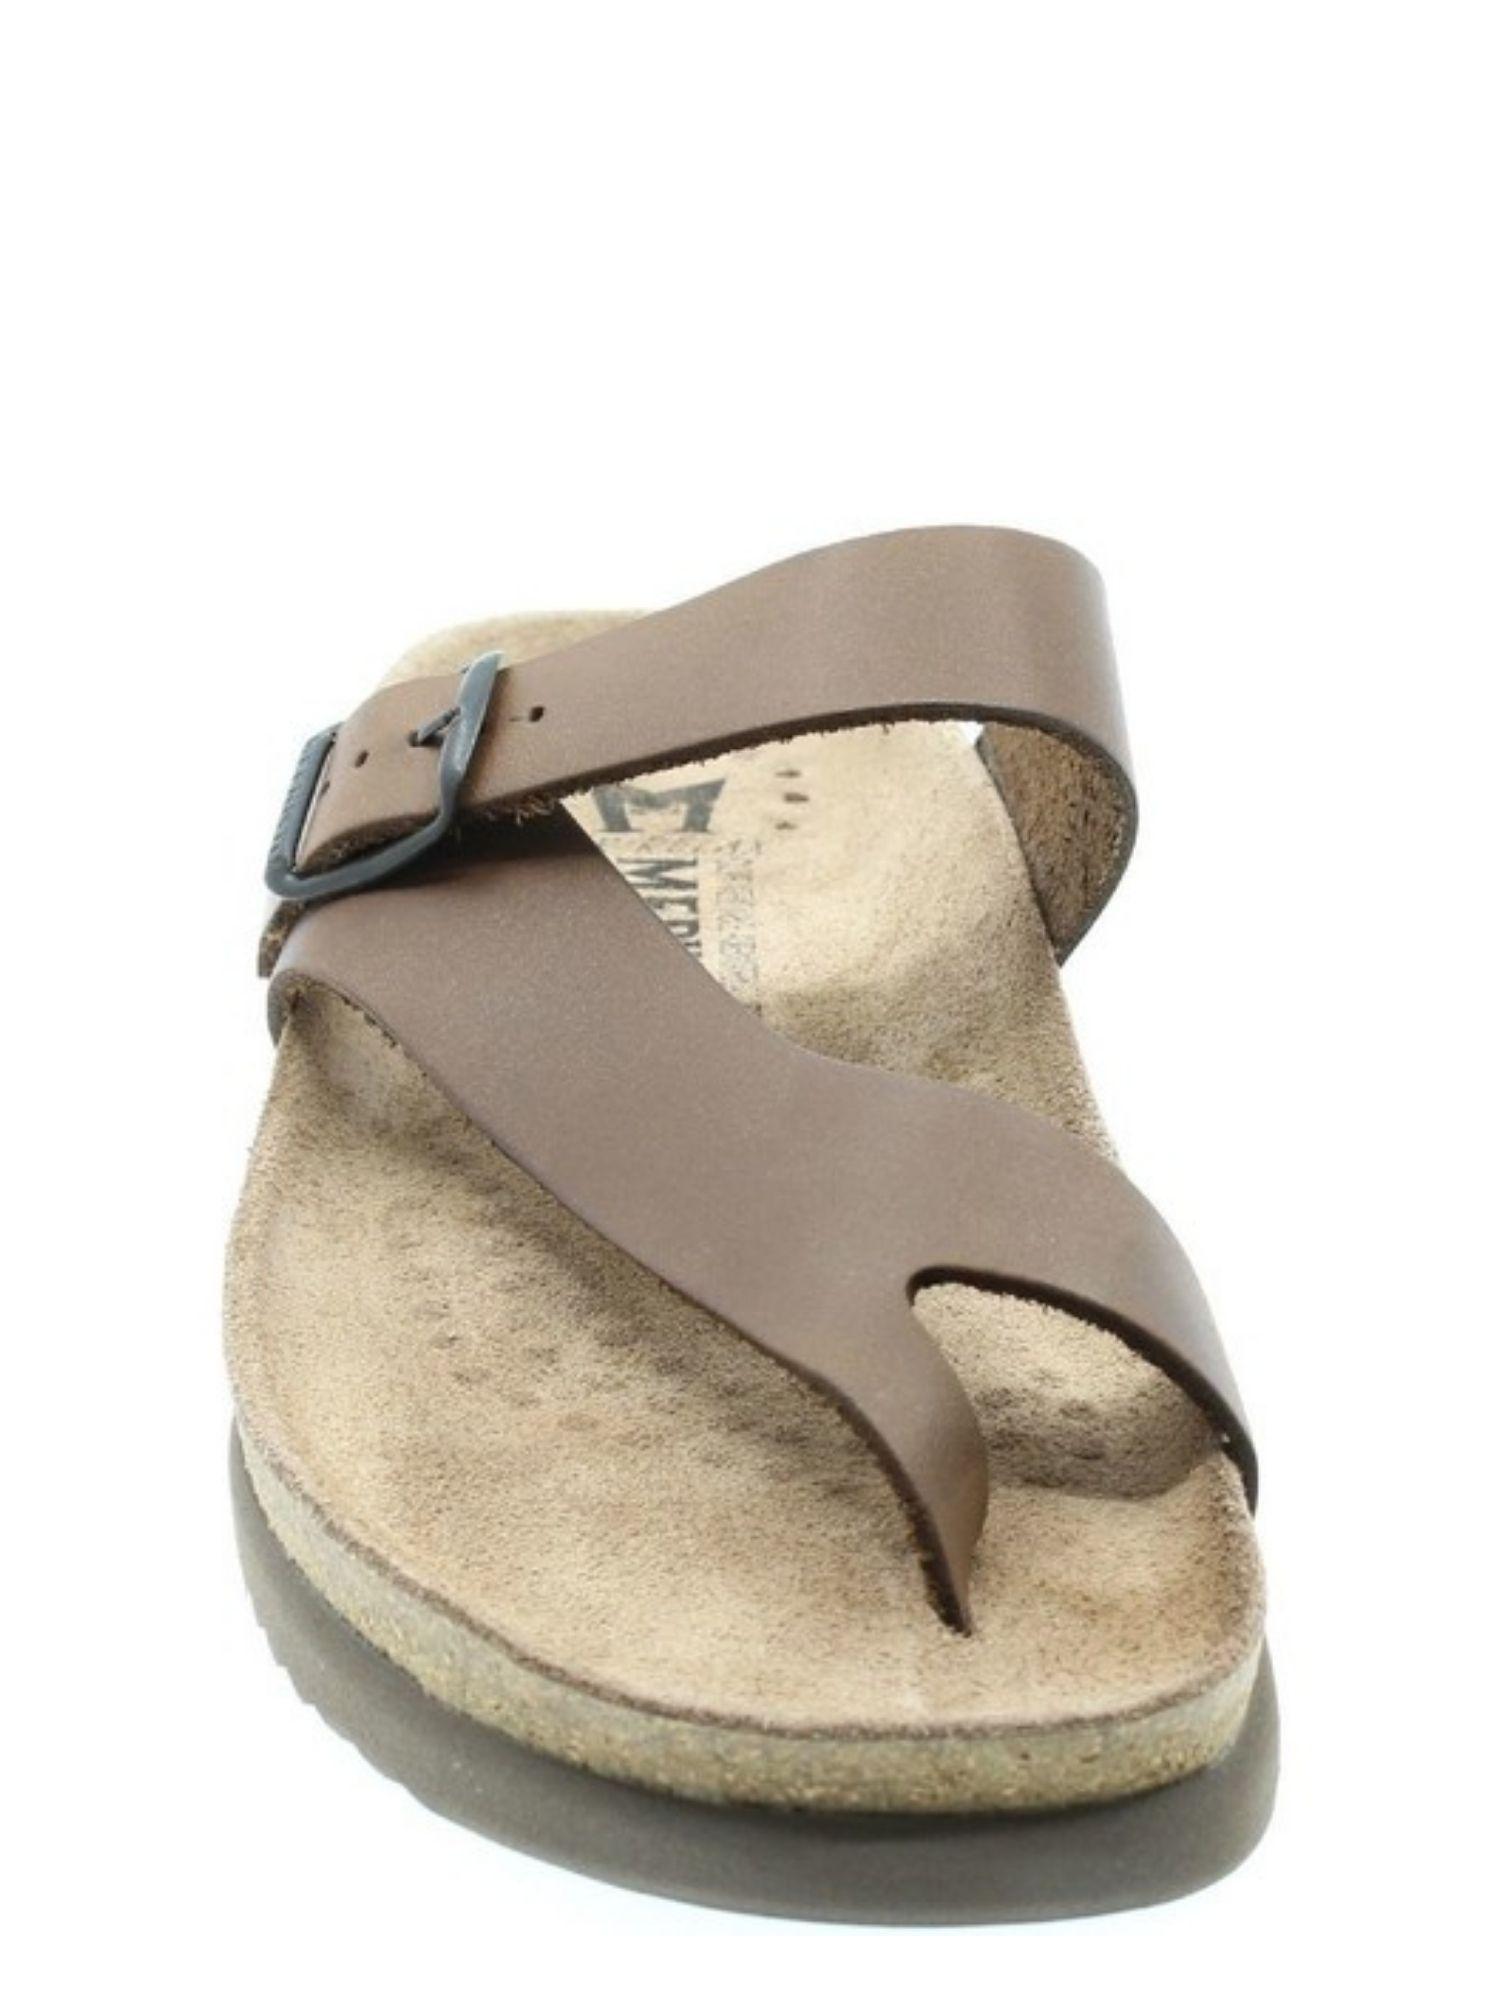 Sandalo Mephisto Uomo Niels Marrone2 2